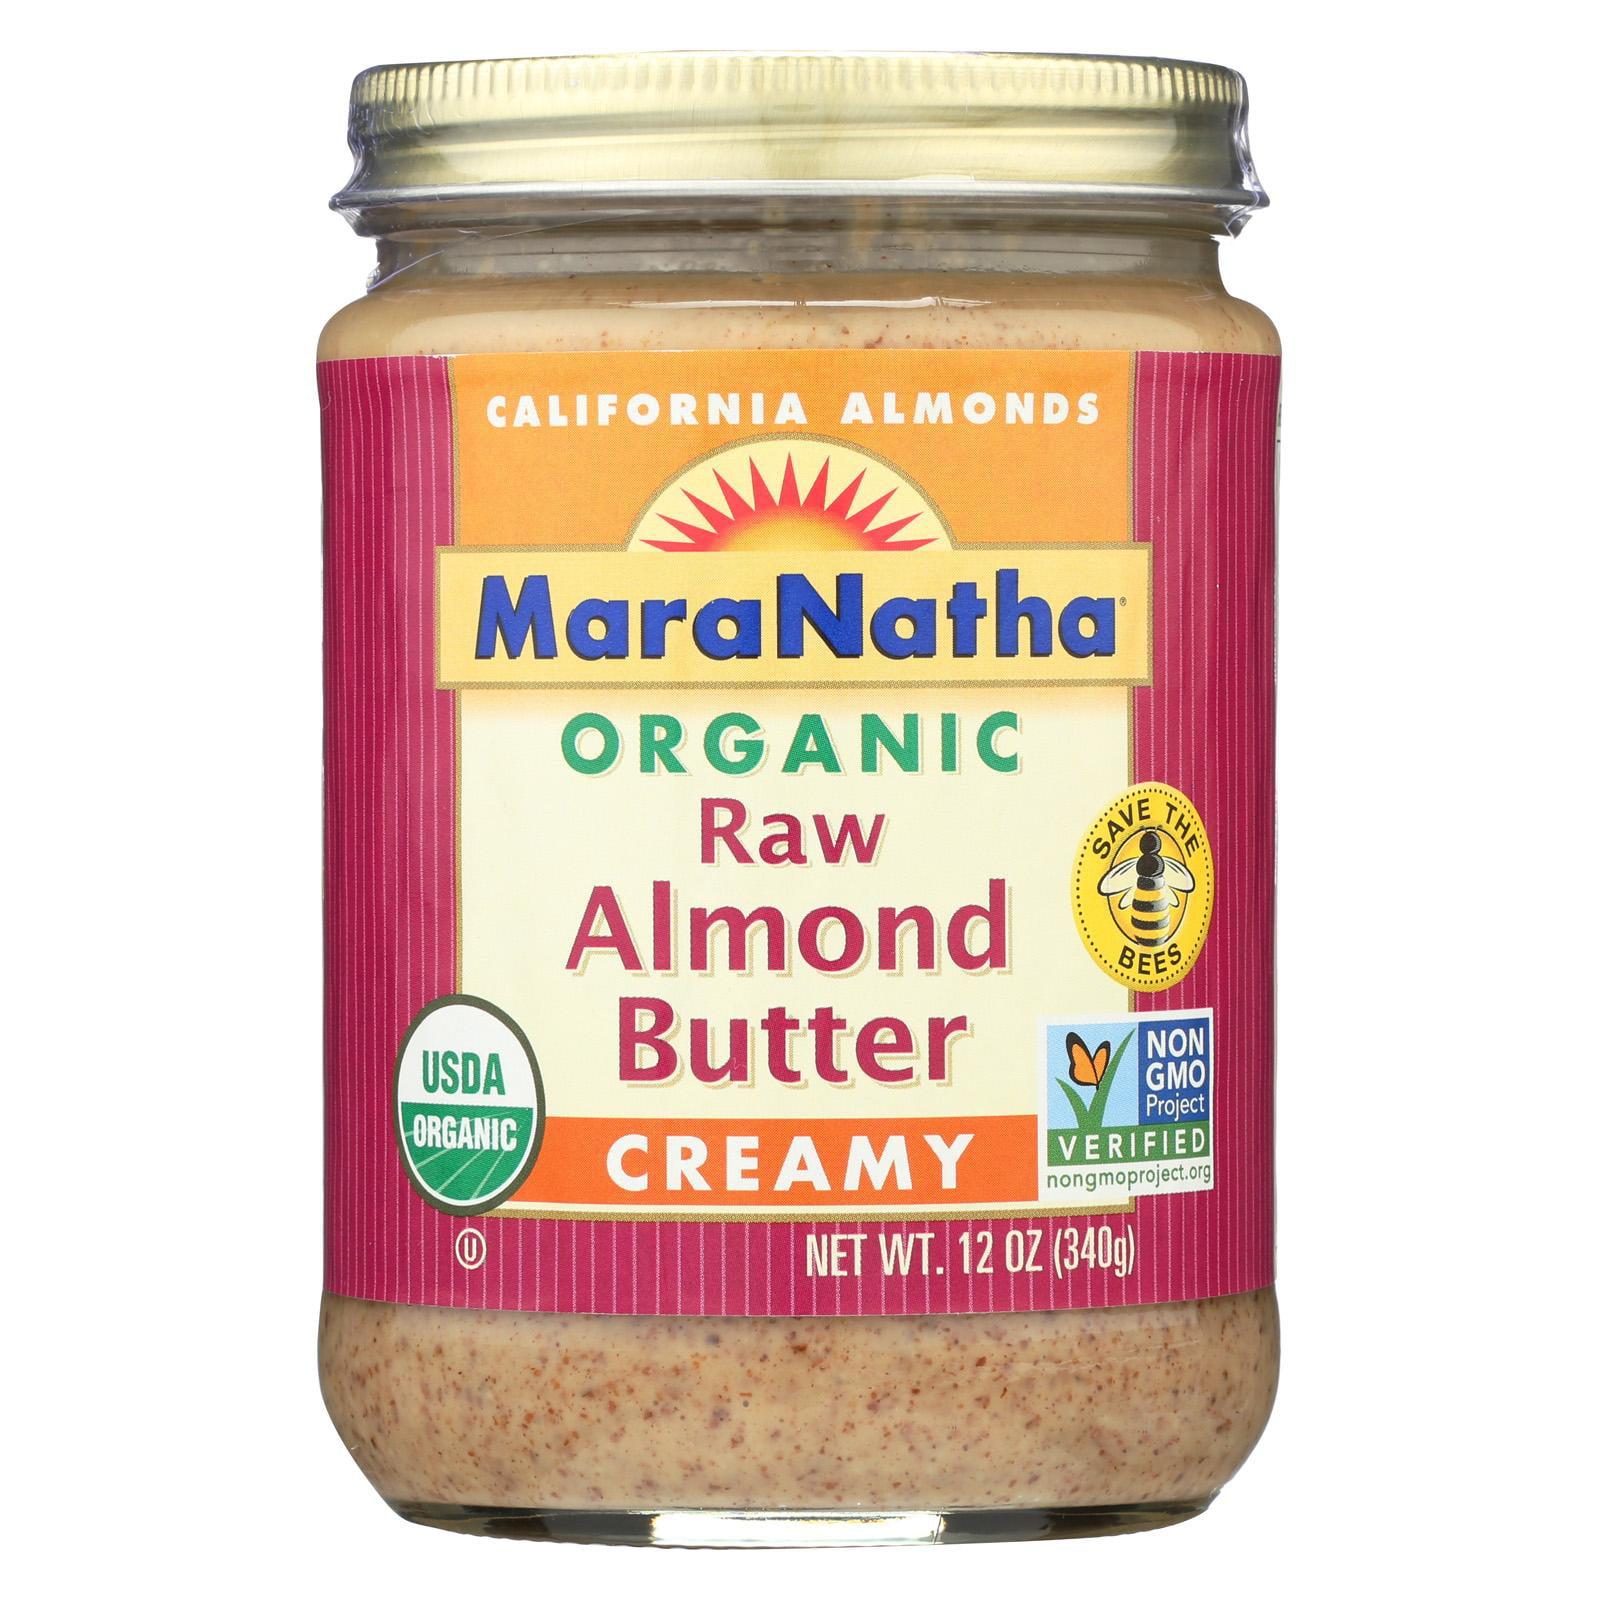 MaraNatha Organic Raw Almond Butter, Creamy, 12 oz.